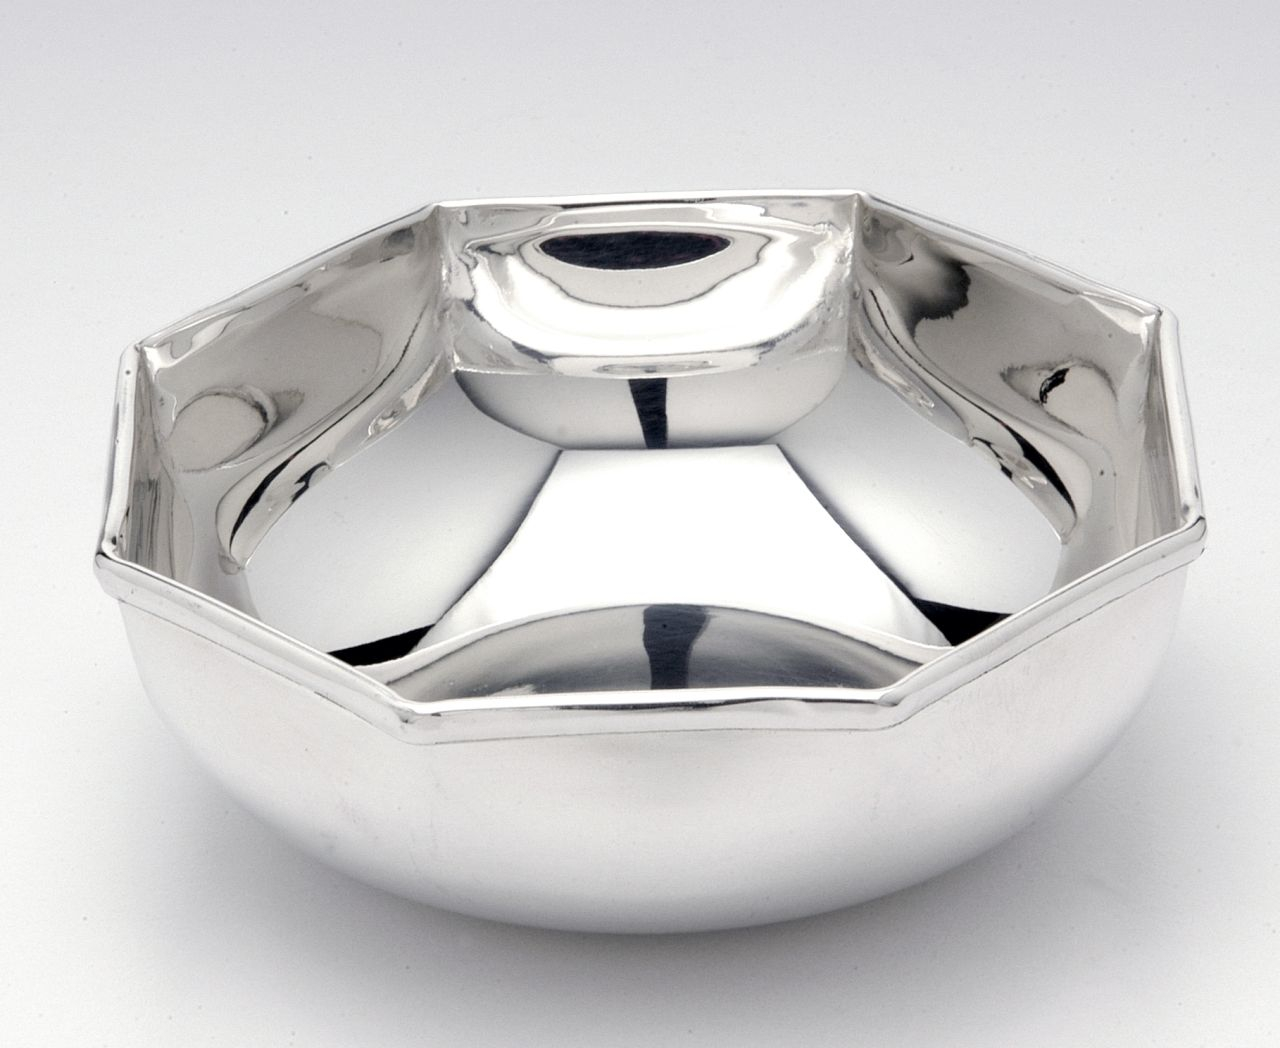 Ciotola placcata argento stile Ottagonale cm.7h diam.26